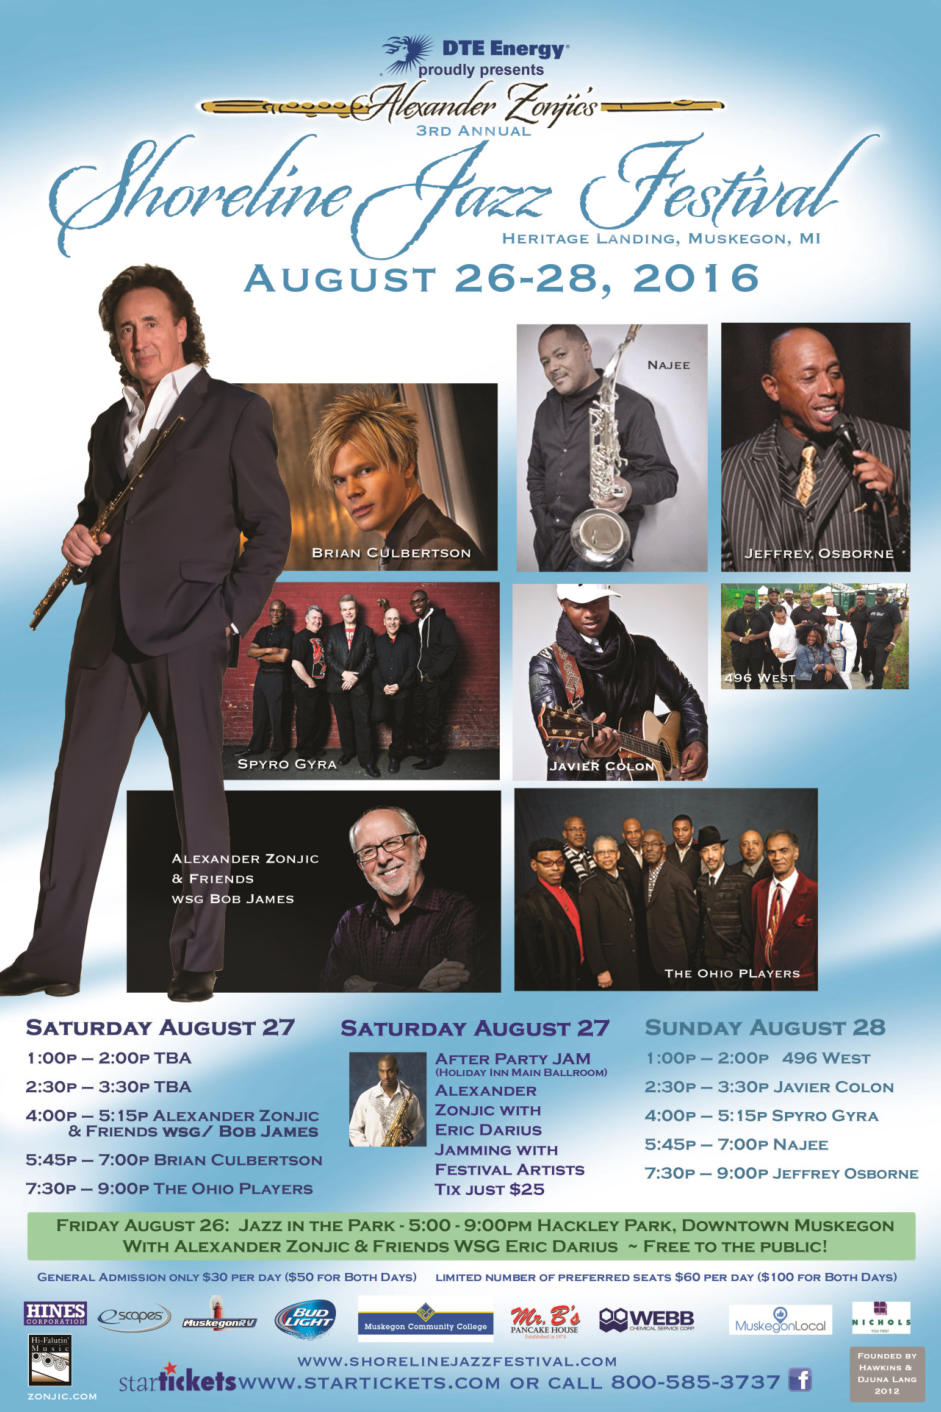 Shoreline Jazz Festival 2016